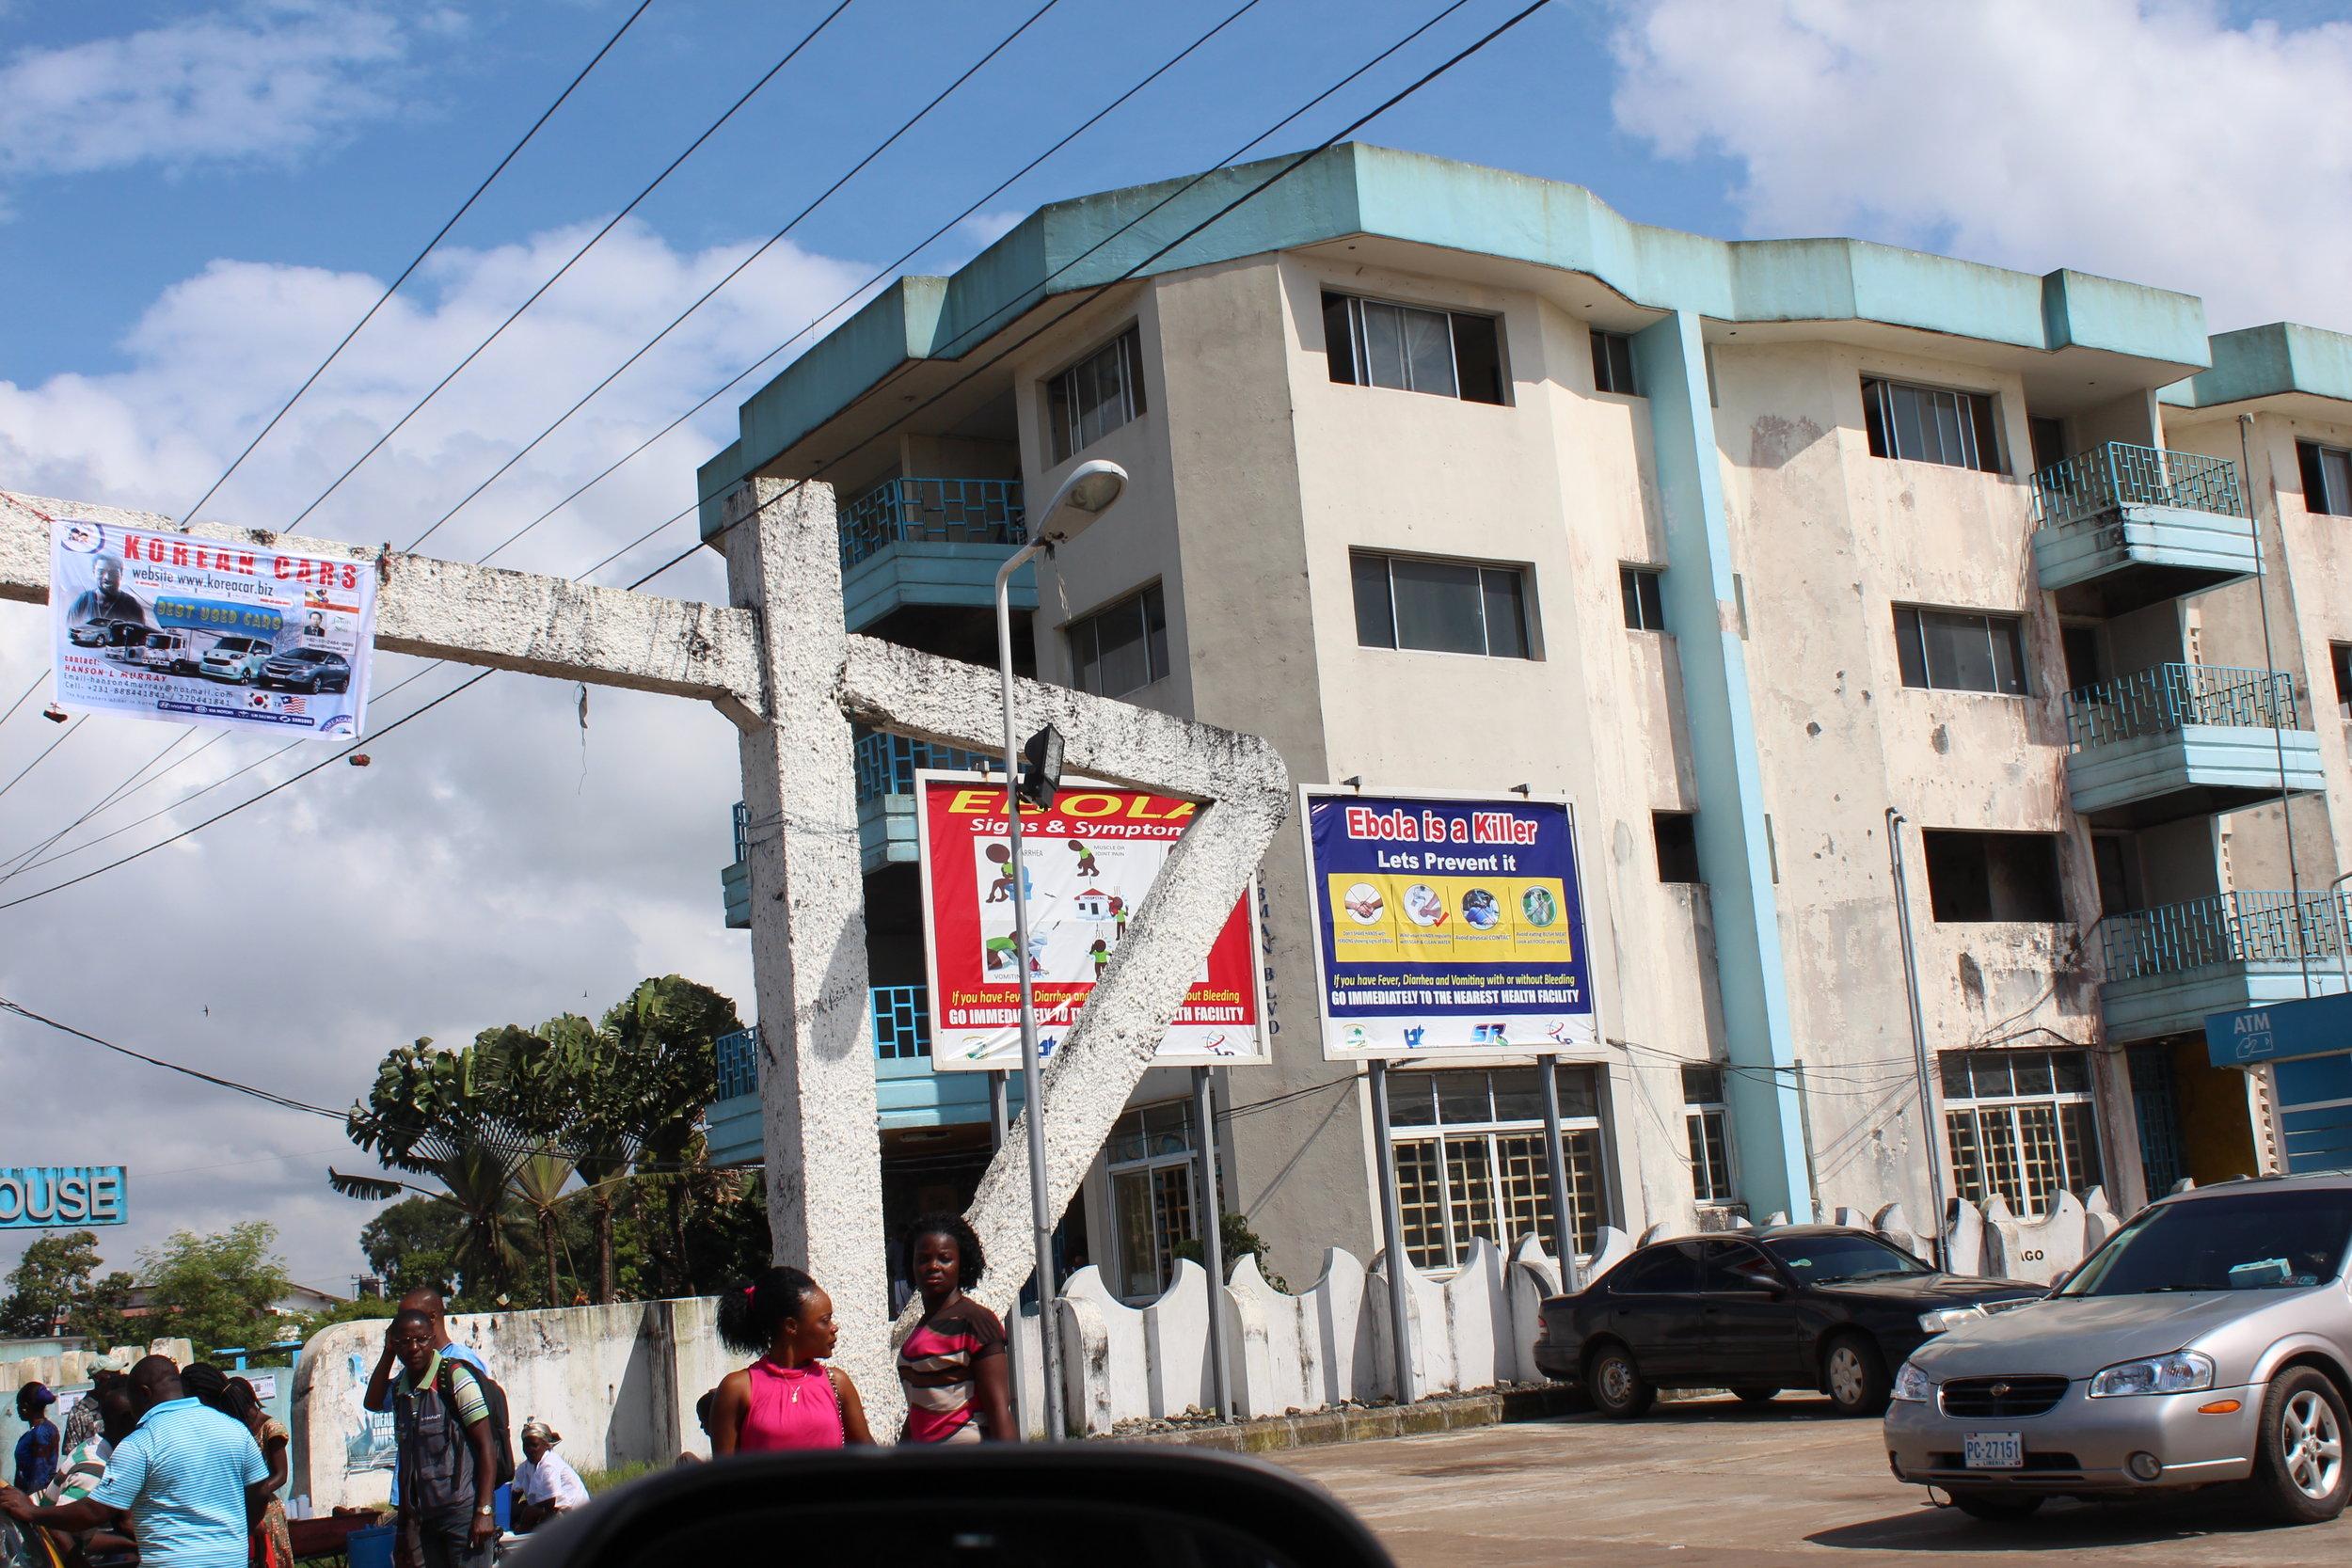 Ebola street sign.10.JPG